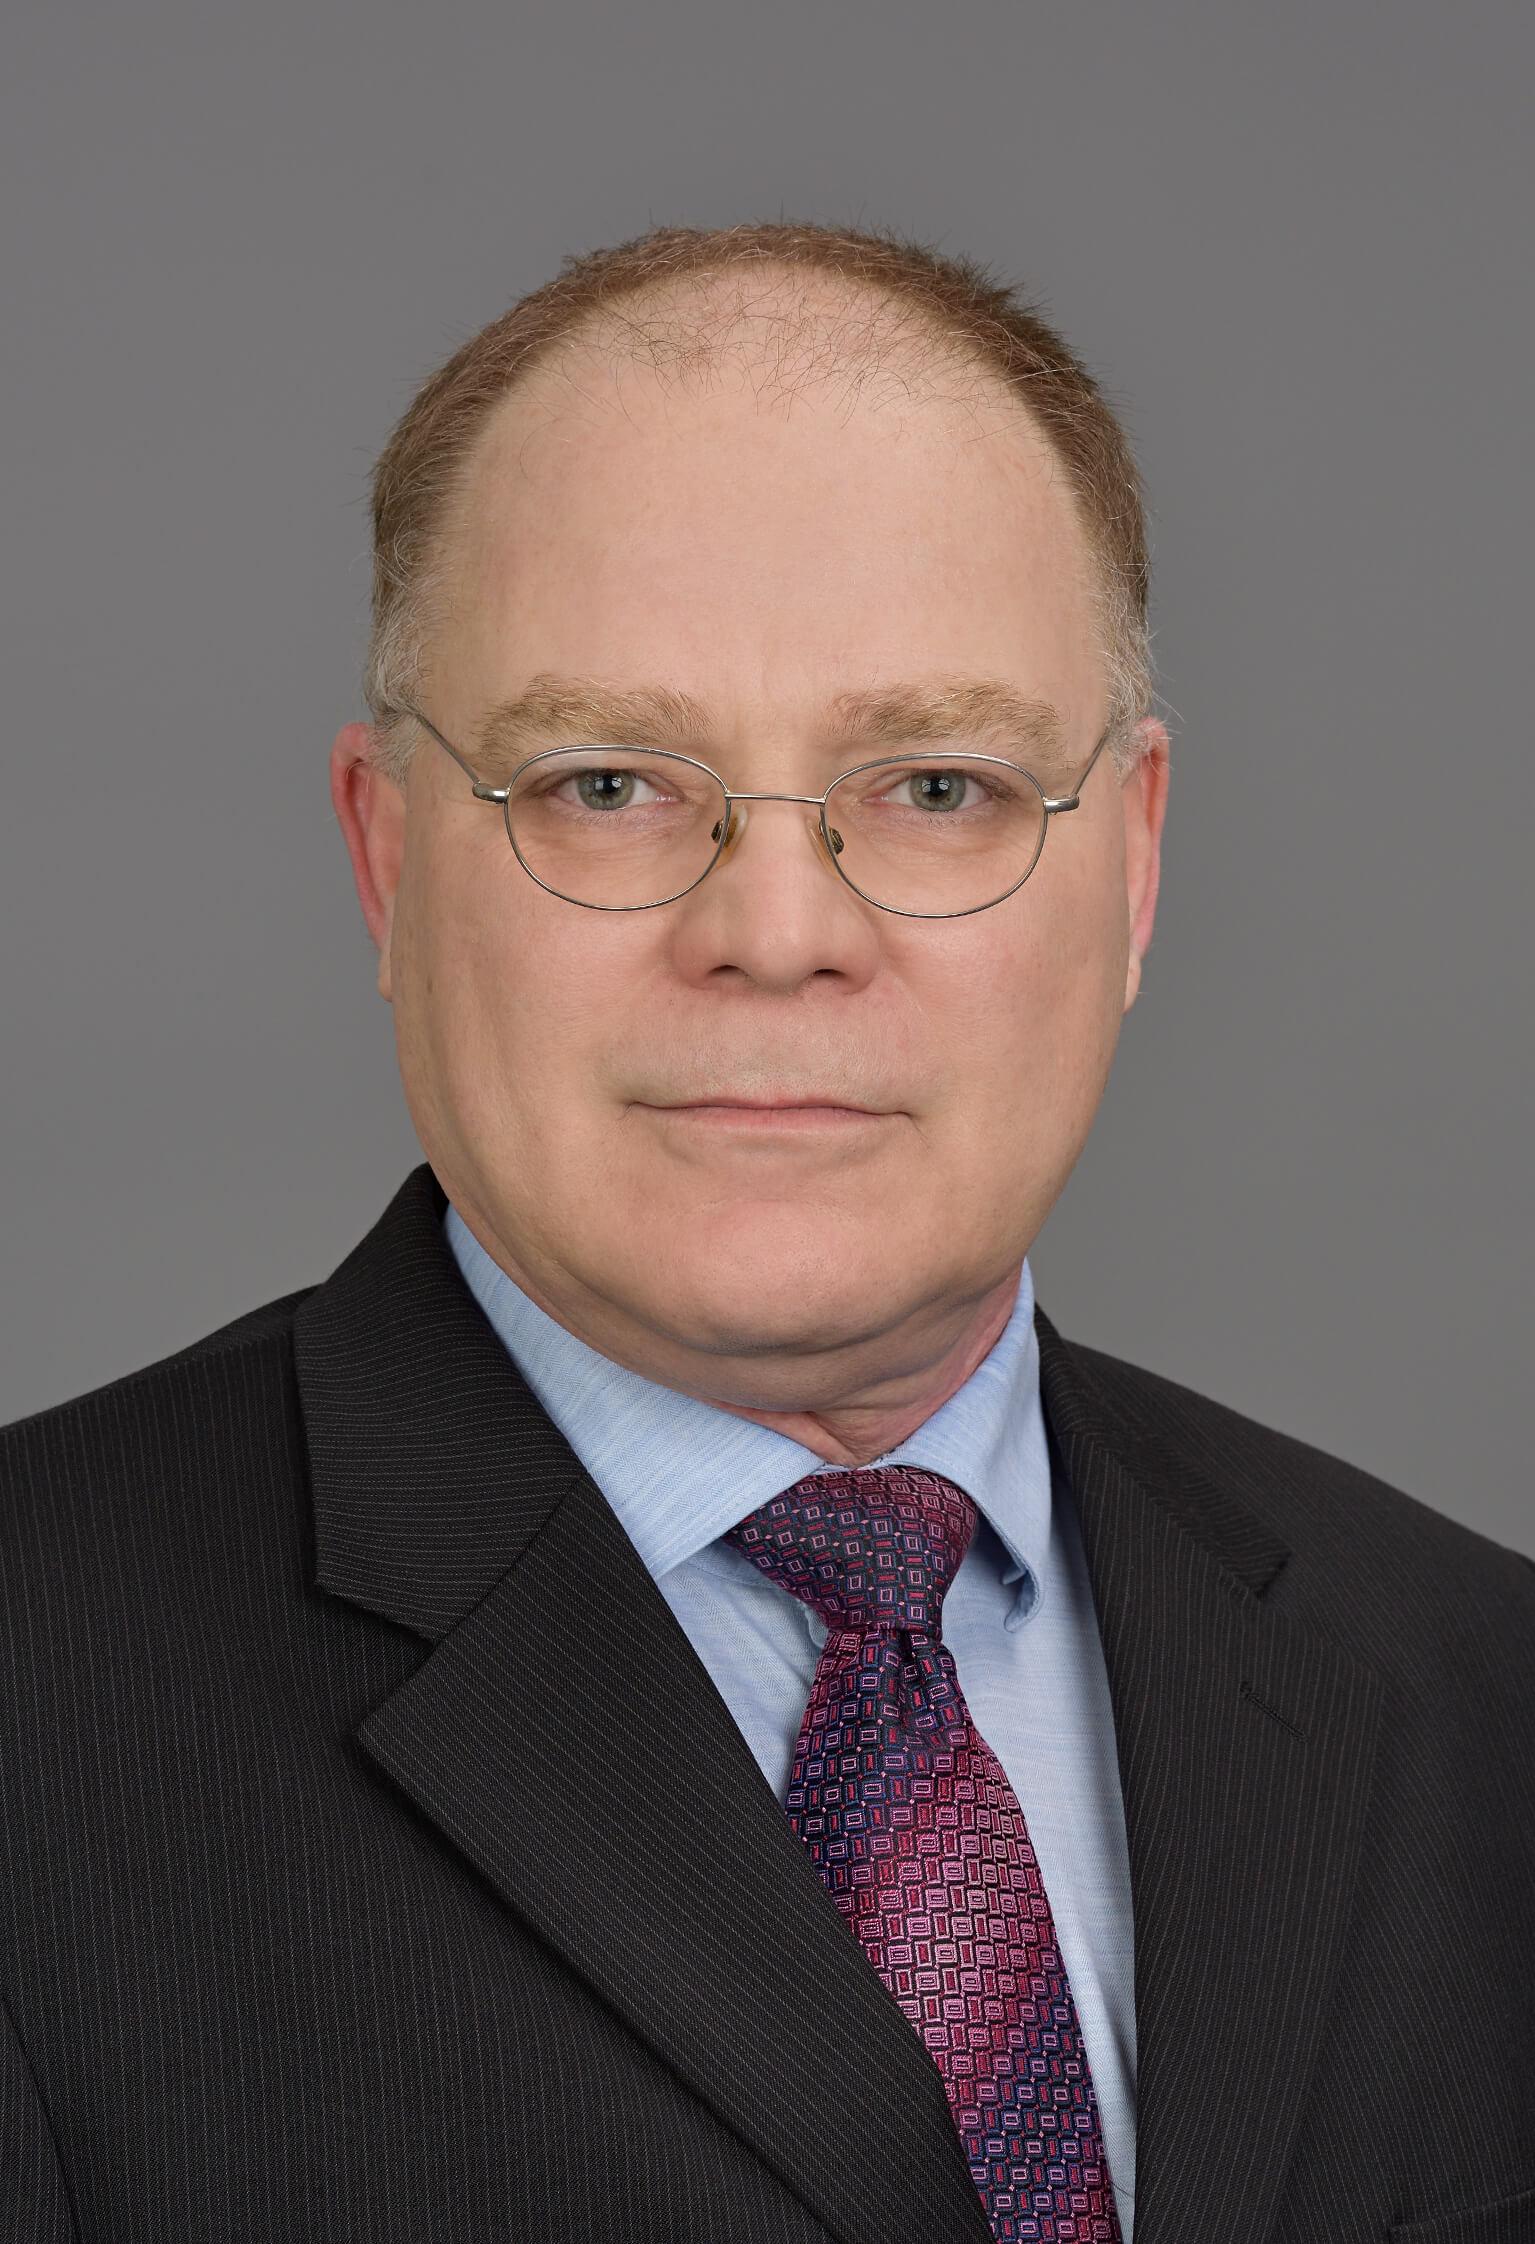 HMKW Professor Dr. Stefan Lutz